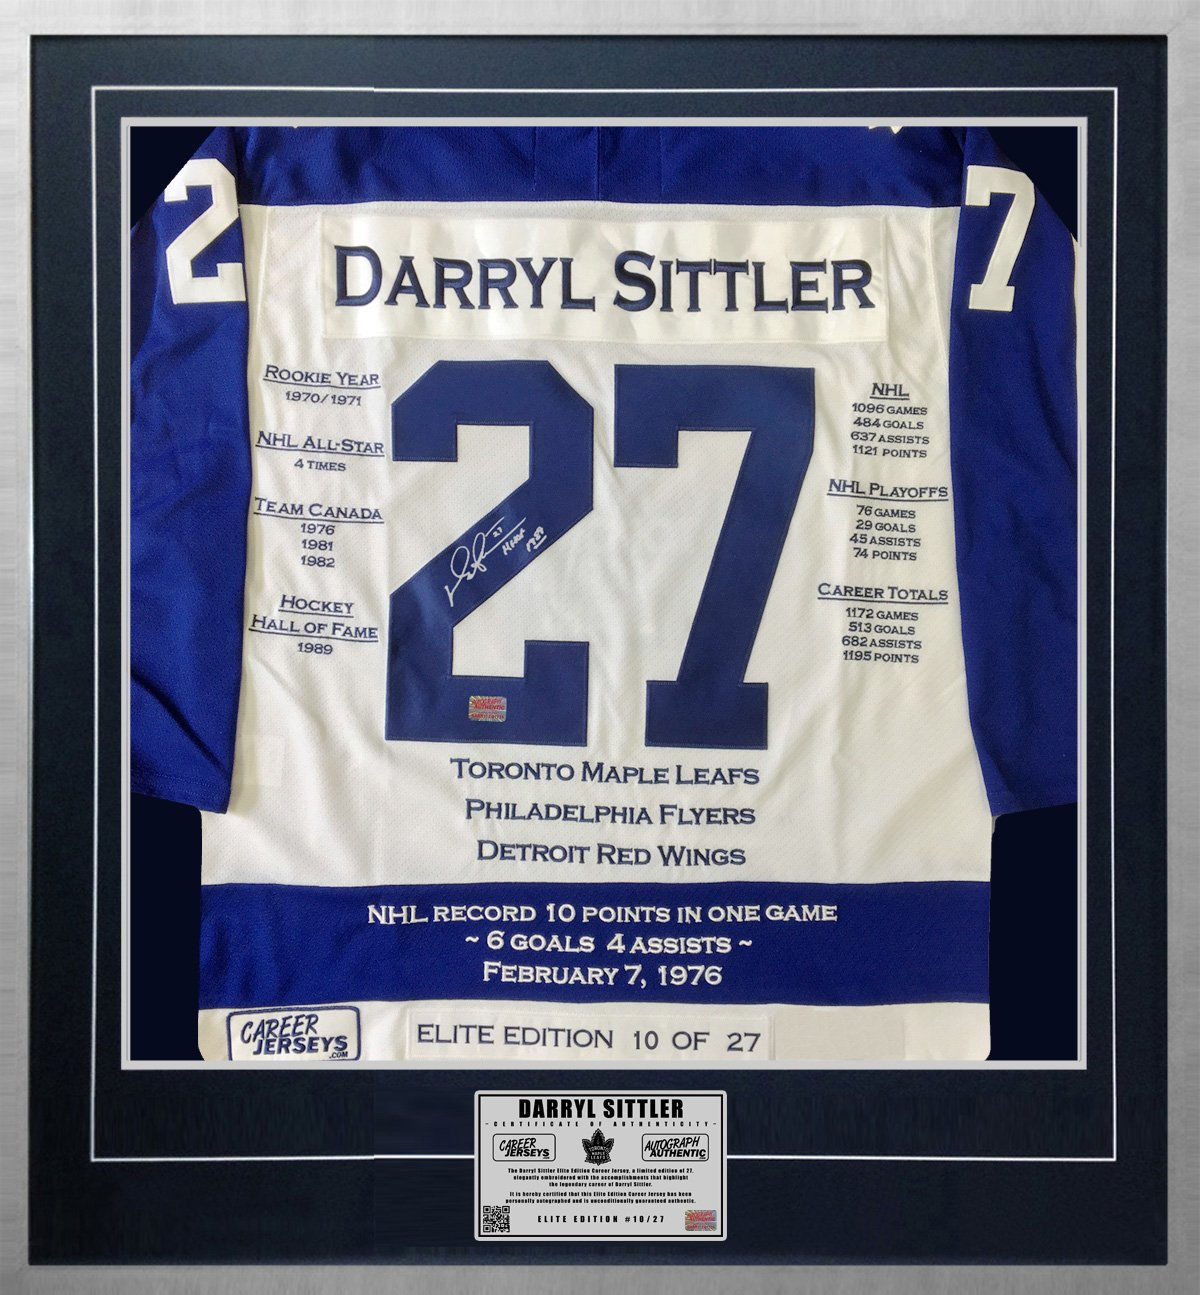 Darryl Sittler Signed Elite Edition Career Jersey 10 of 27 - Ltd Ed, Maple Leafs